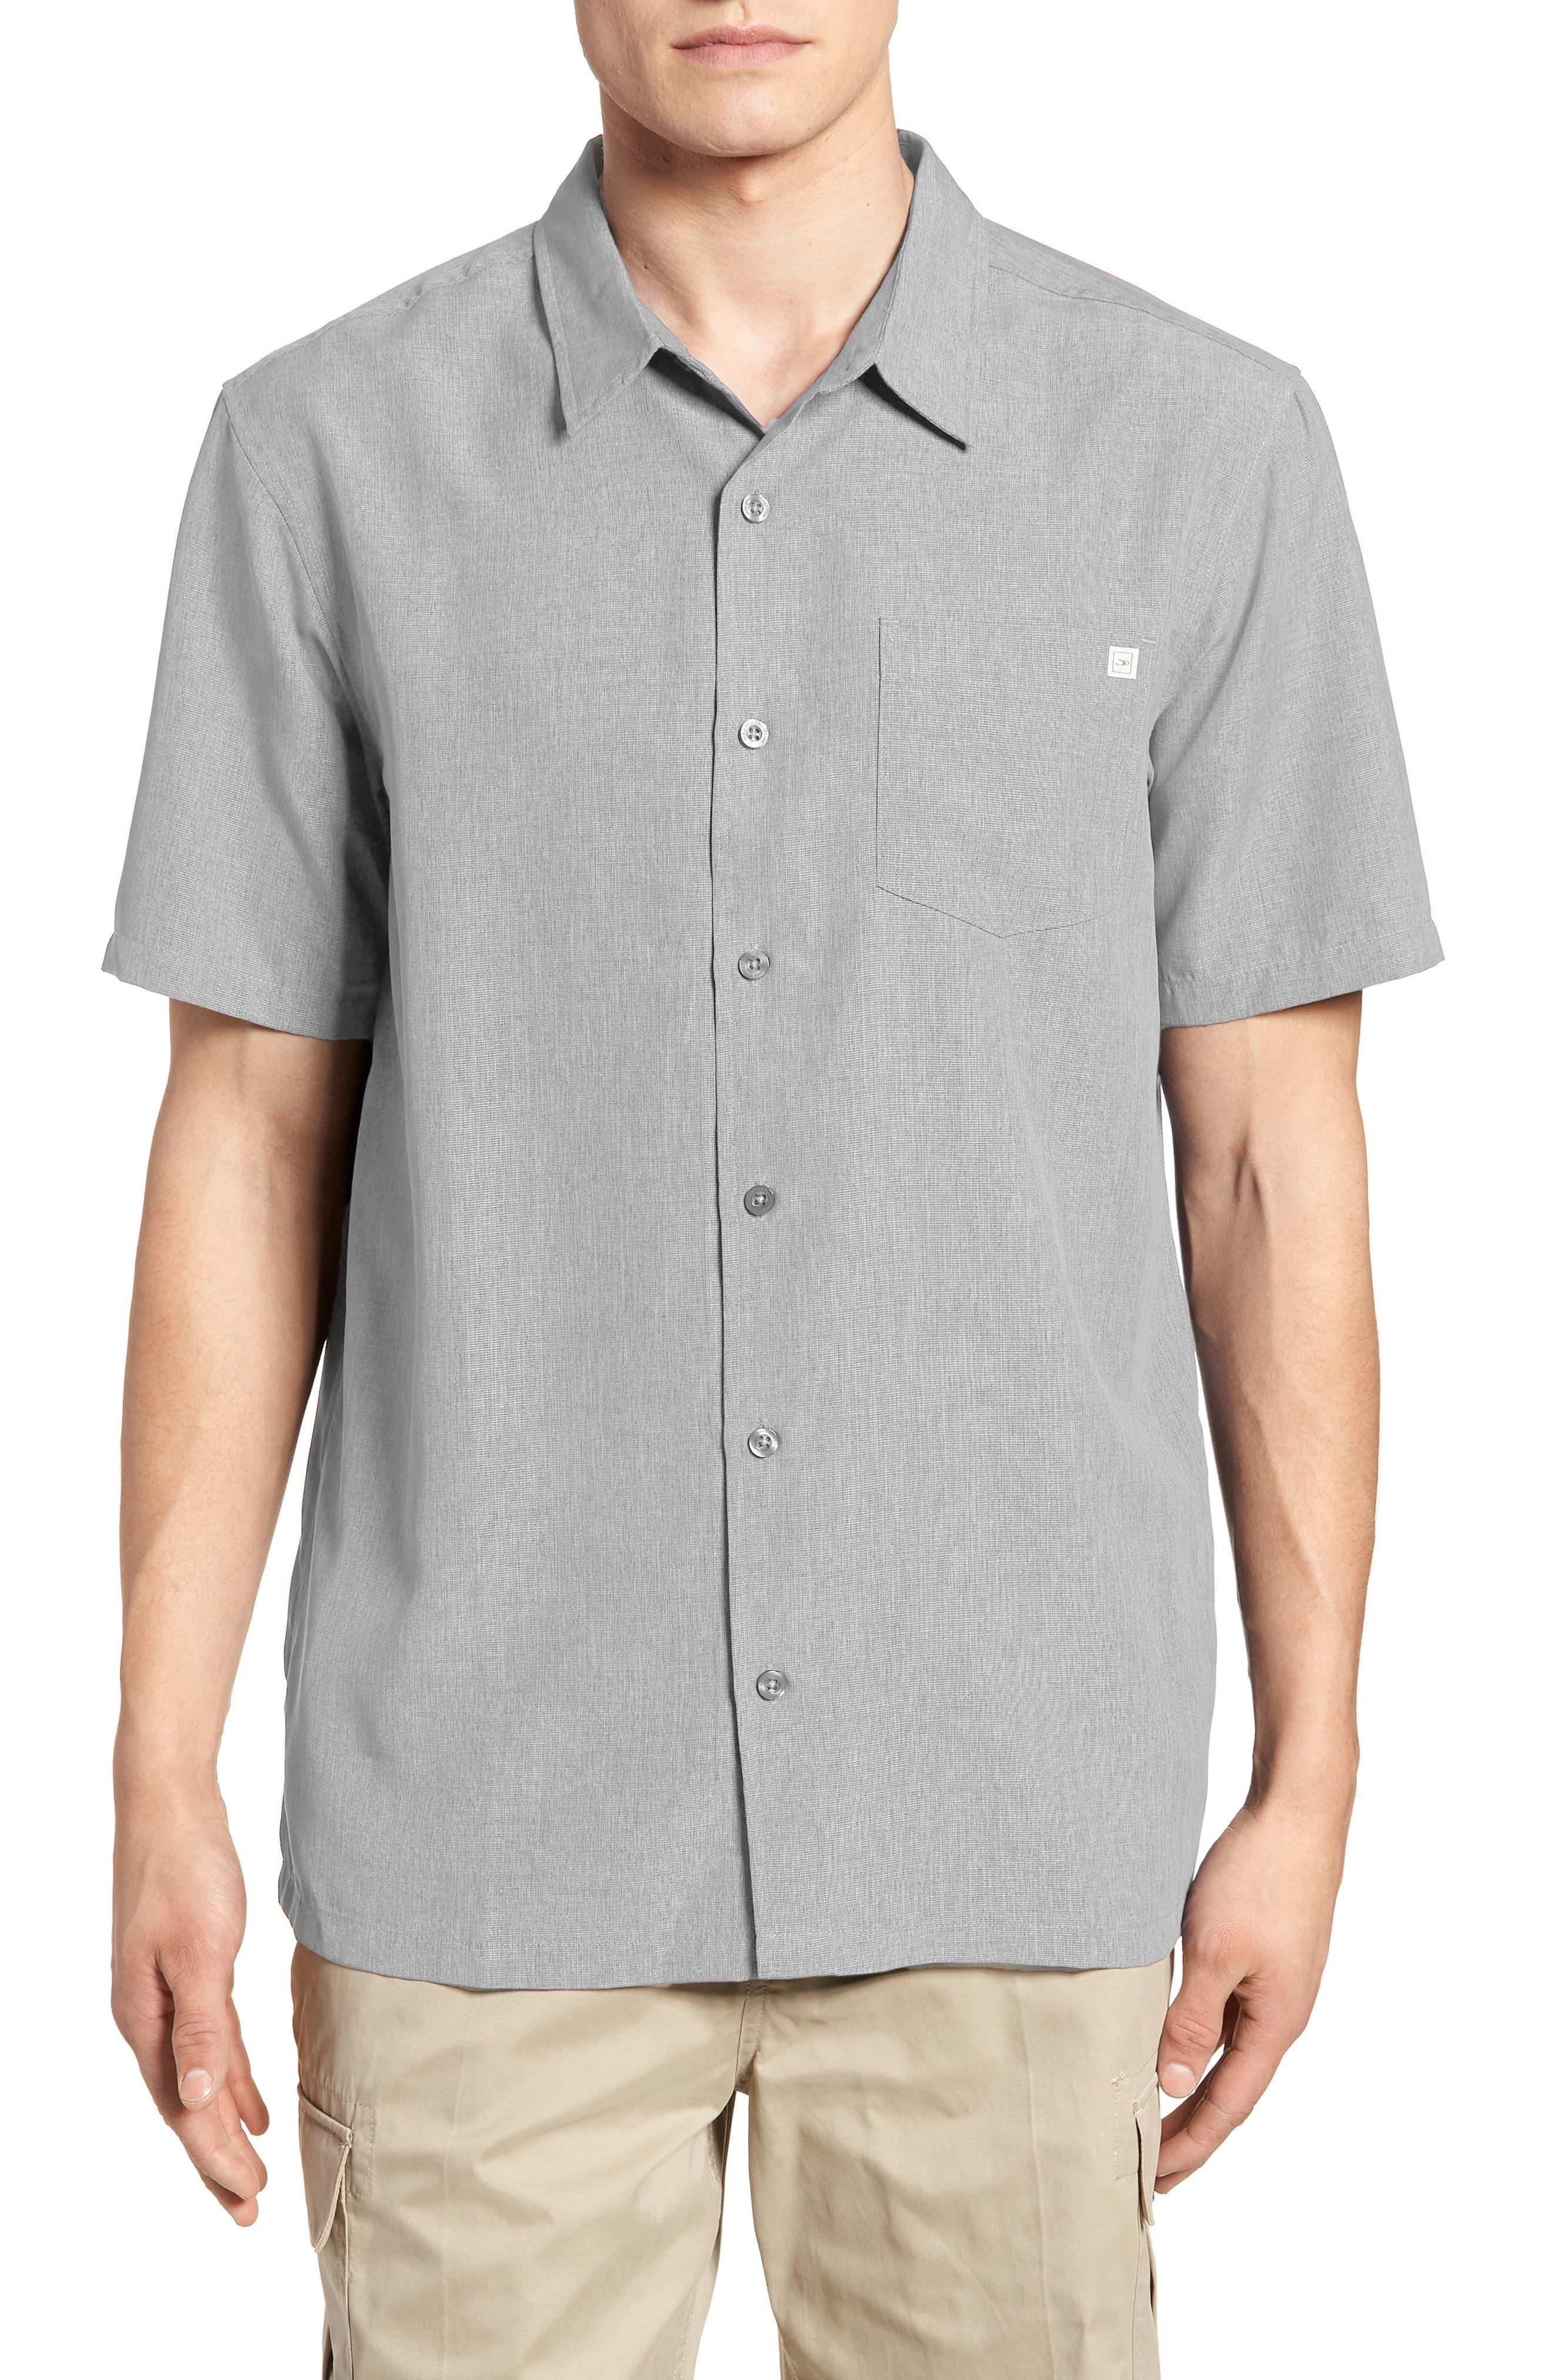 Liberty Regular Fit Short Sleeve Sport Shirt,                         Main,                         color, Light Grey